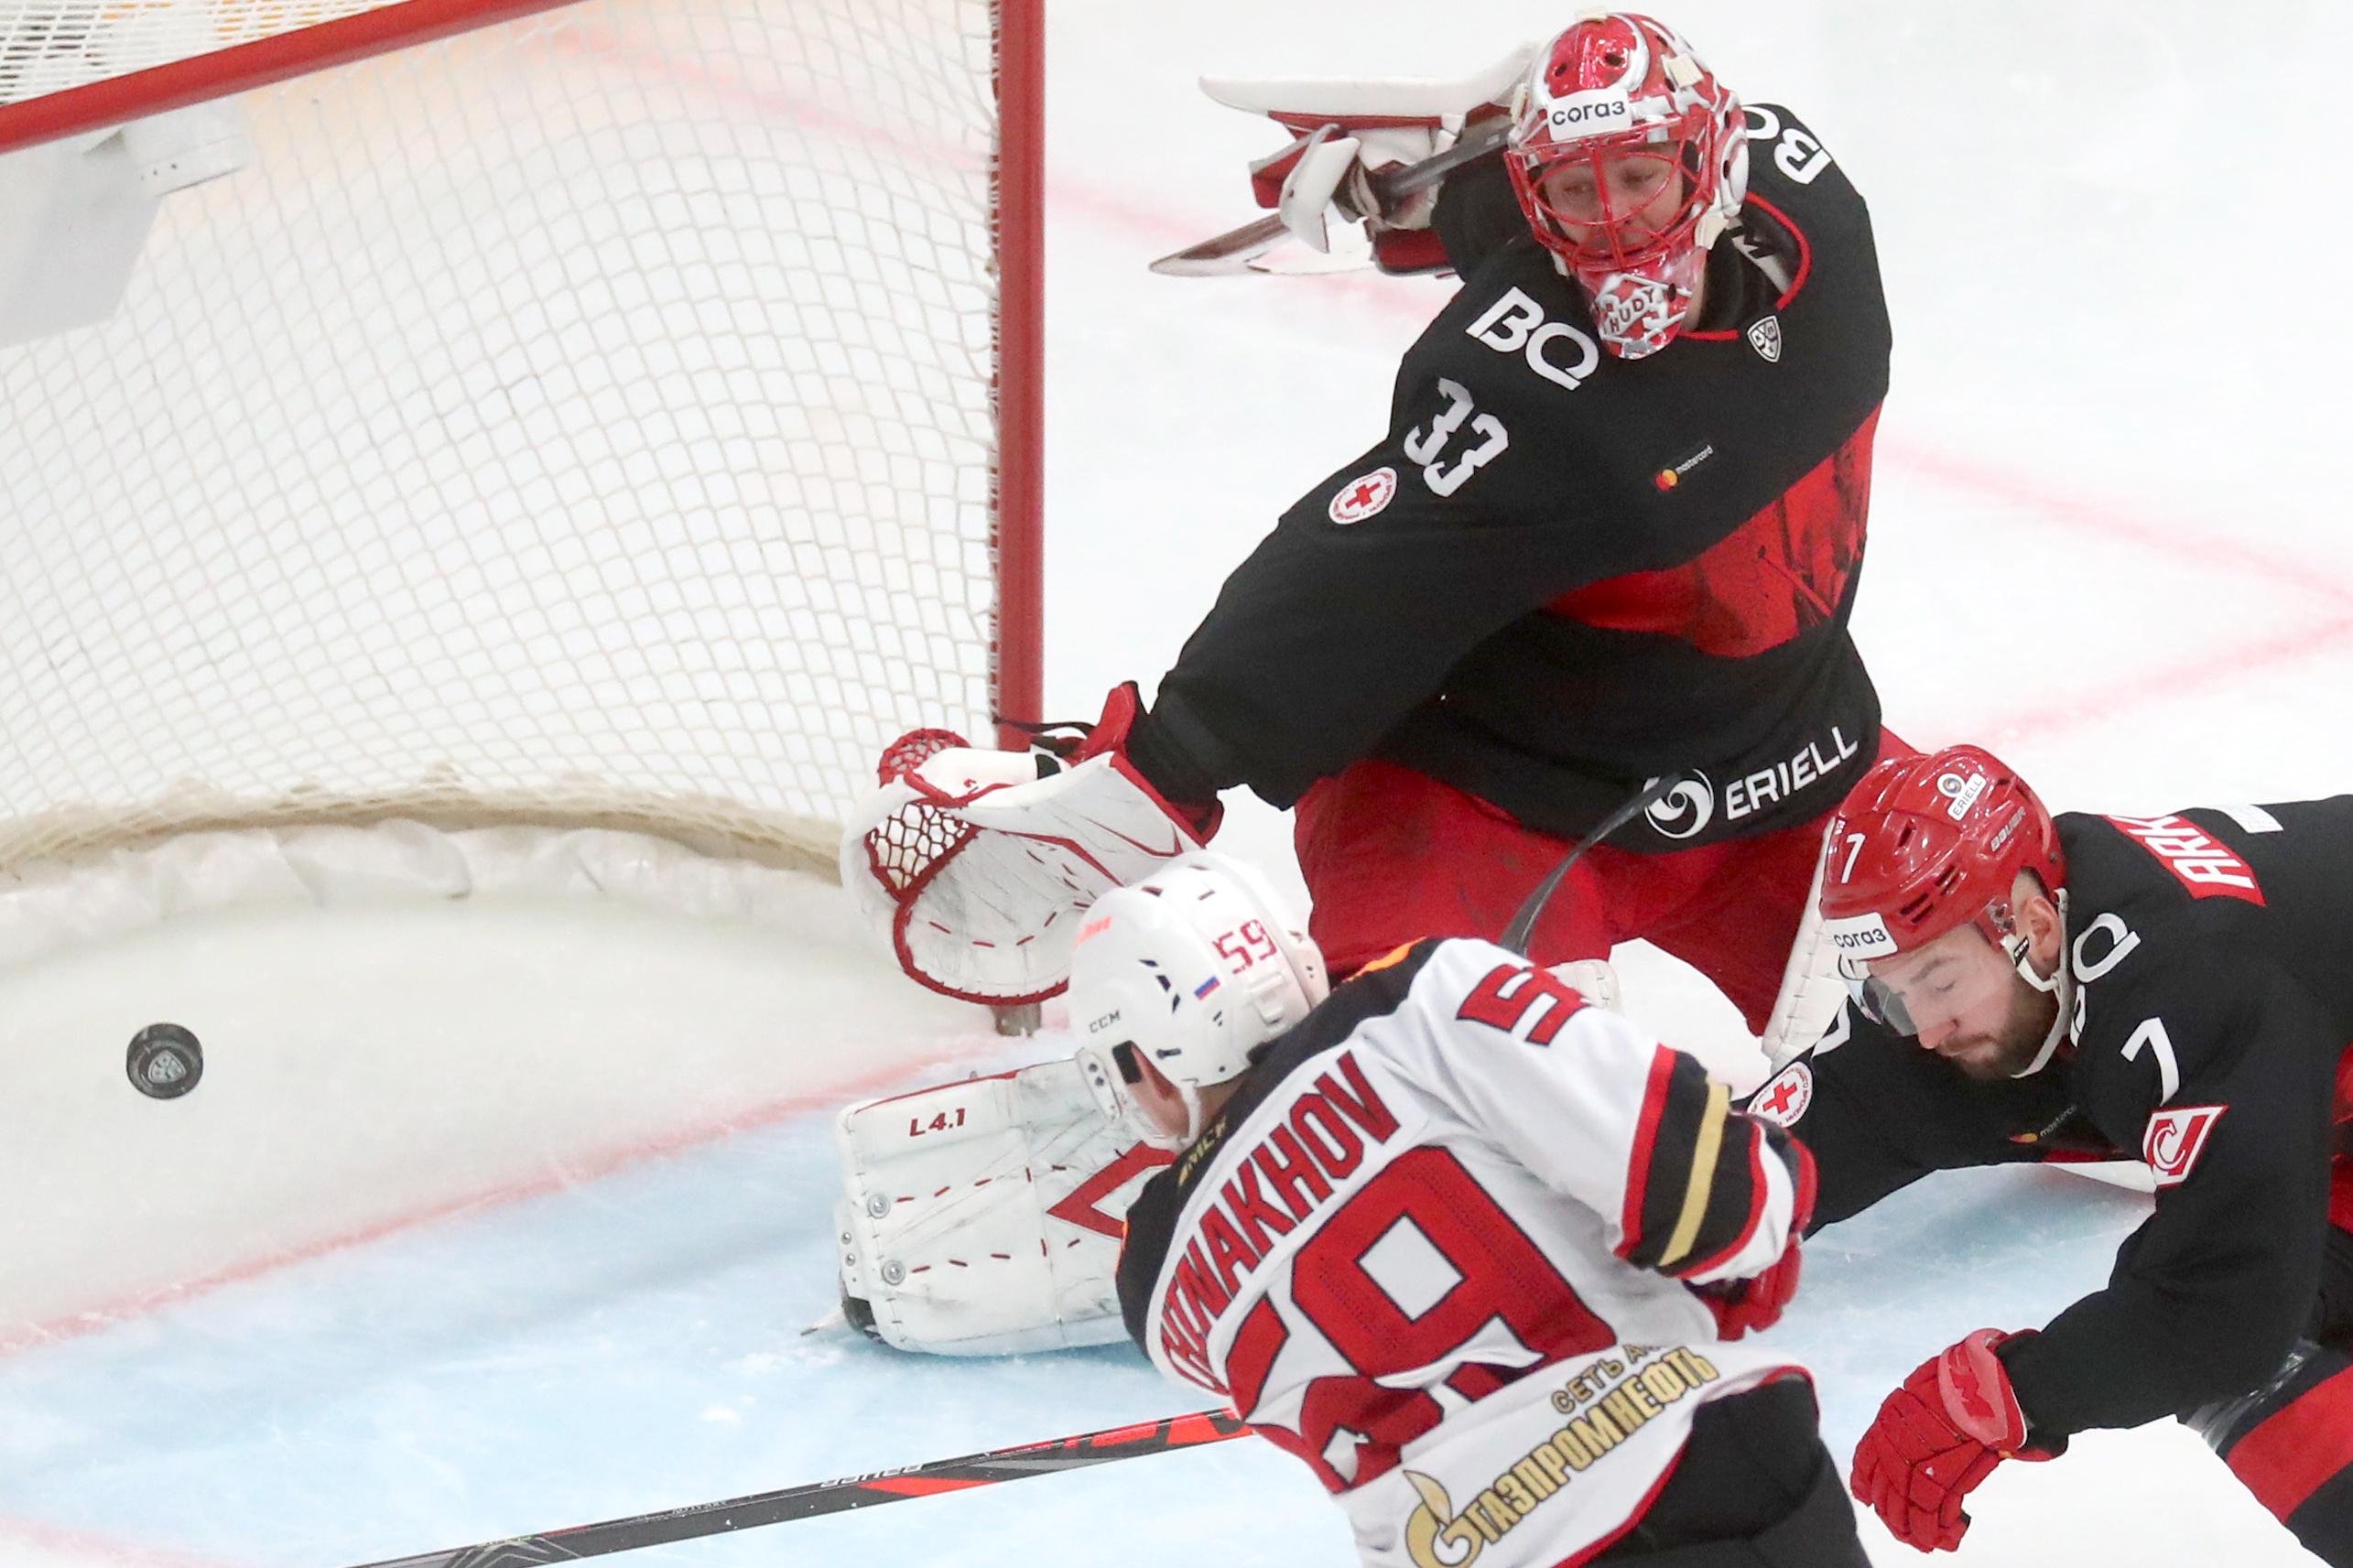 2020/2021 Kontinental Hockey League Spartak Moscow vs Avangard Omsk